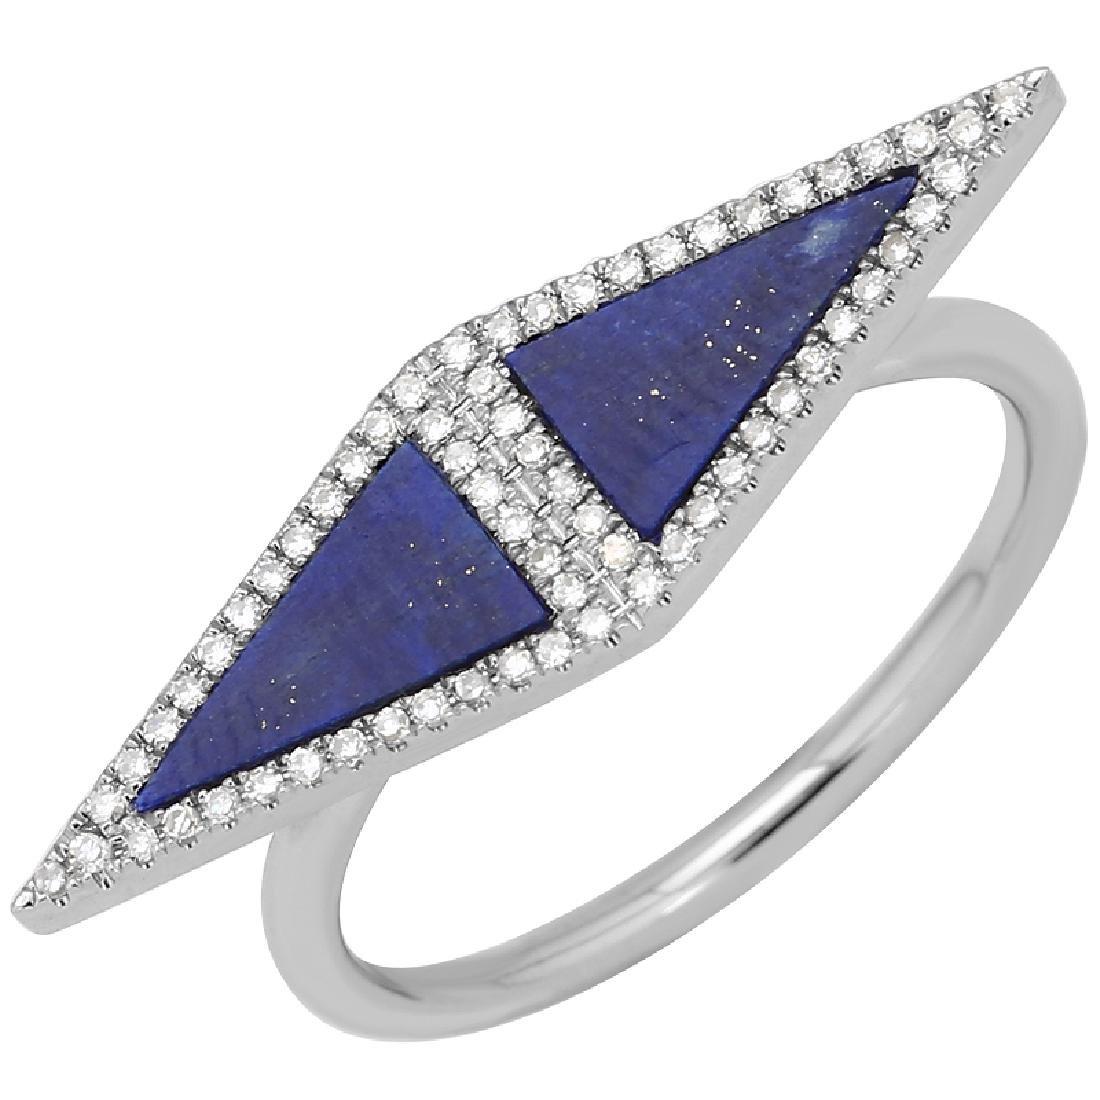 14KT White Gold Gemstone Ring - 2